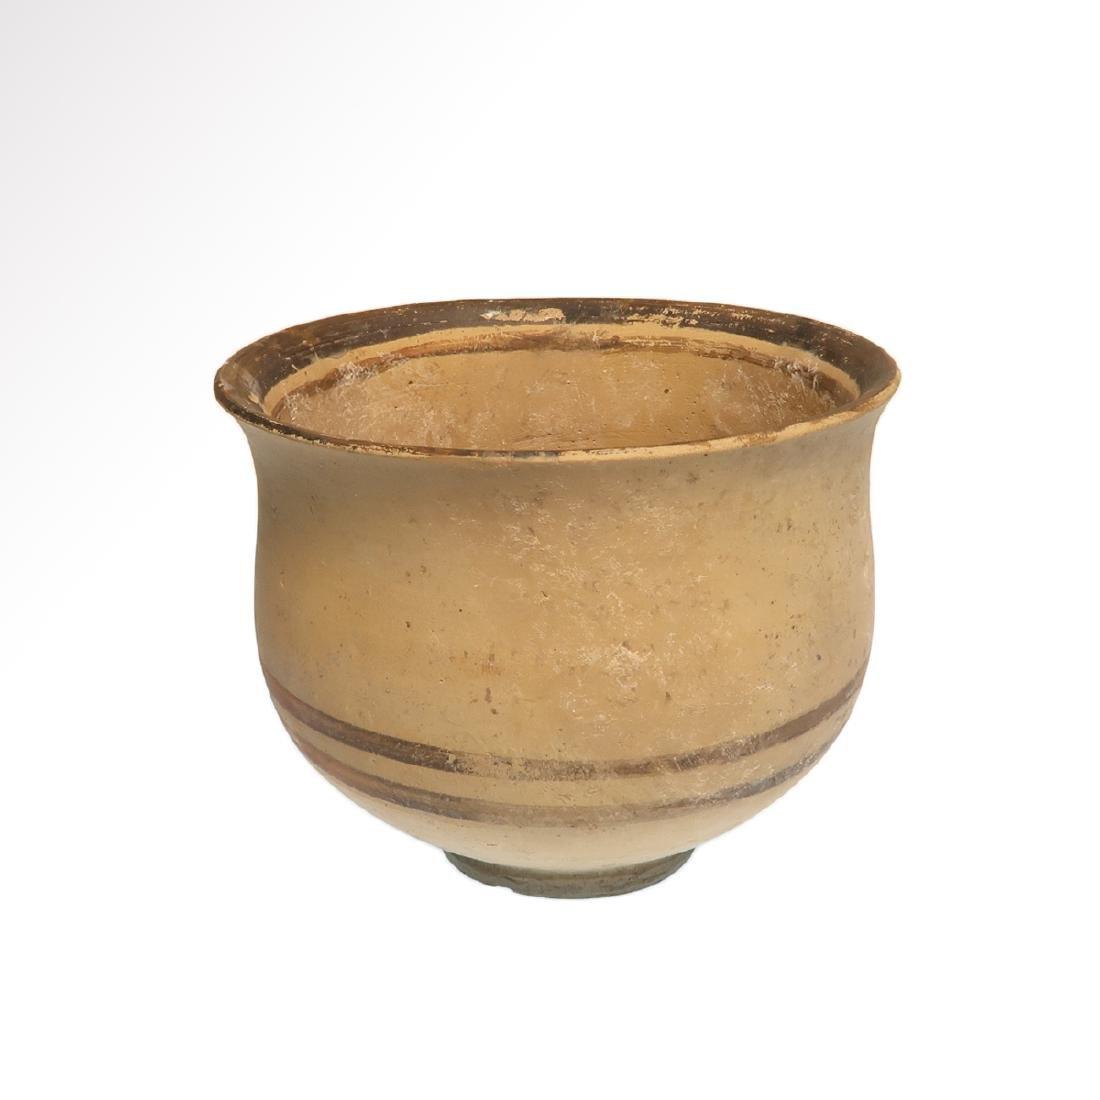 Greek Daunian Cup, c. 4th century B.C. - 3